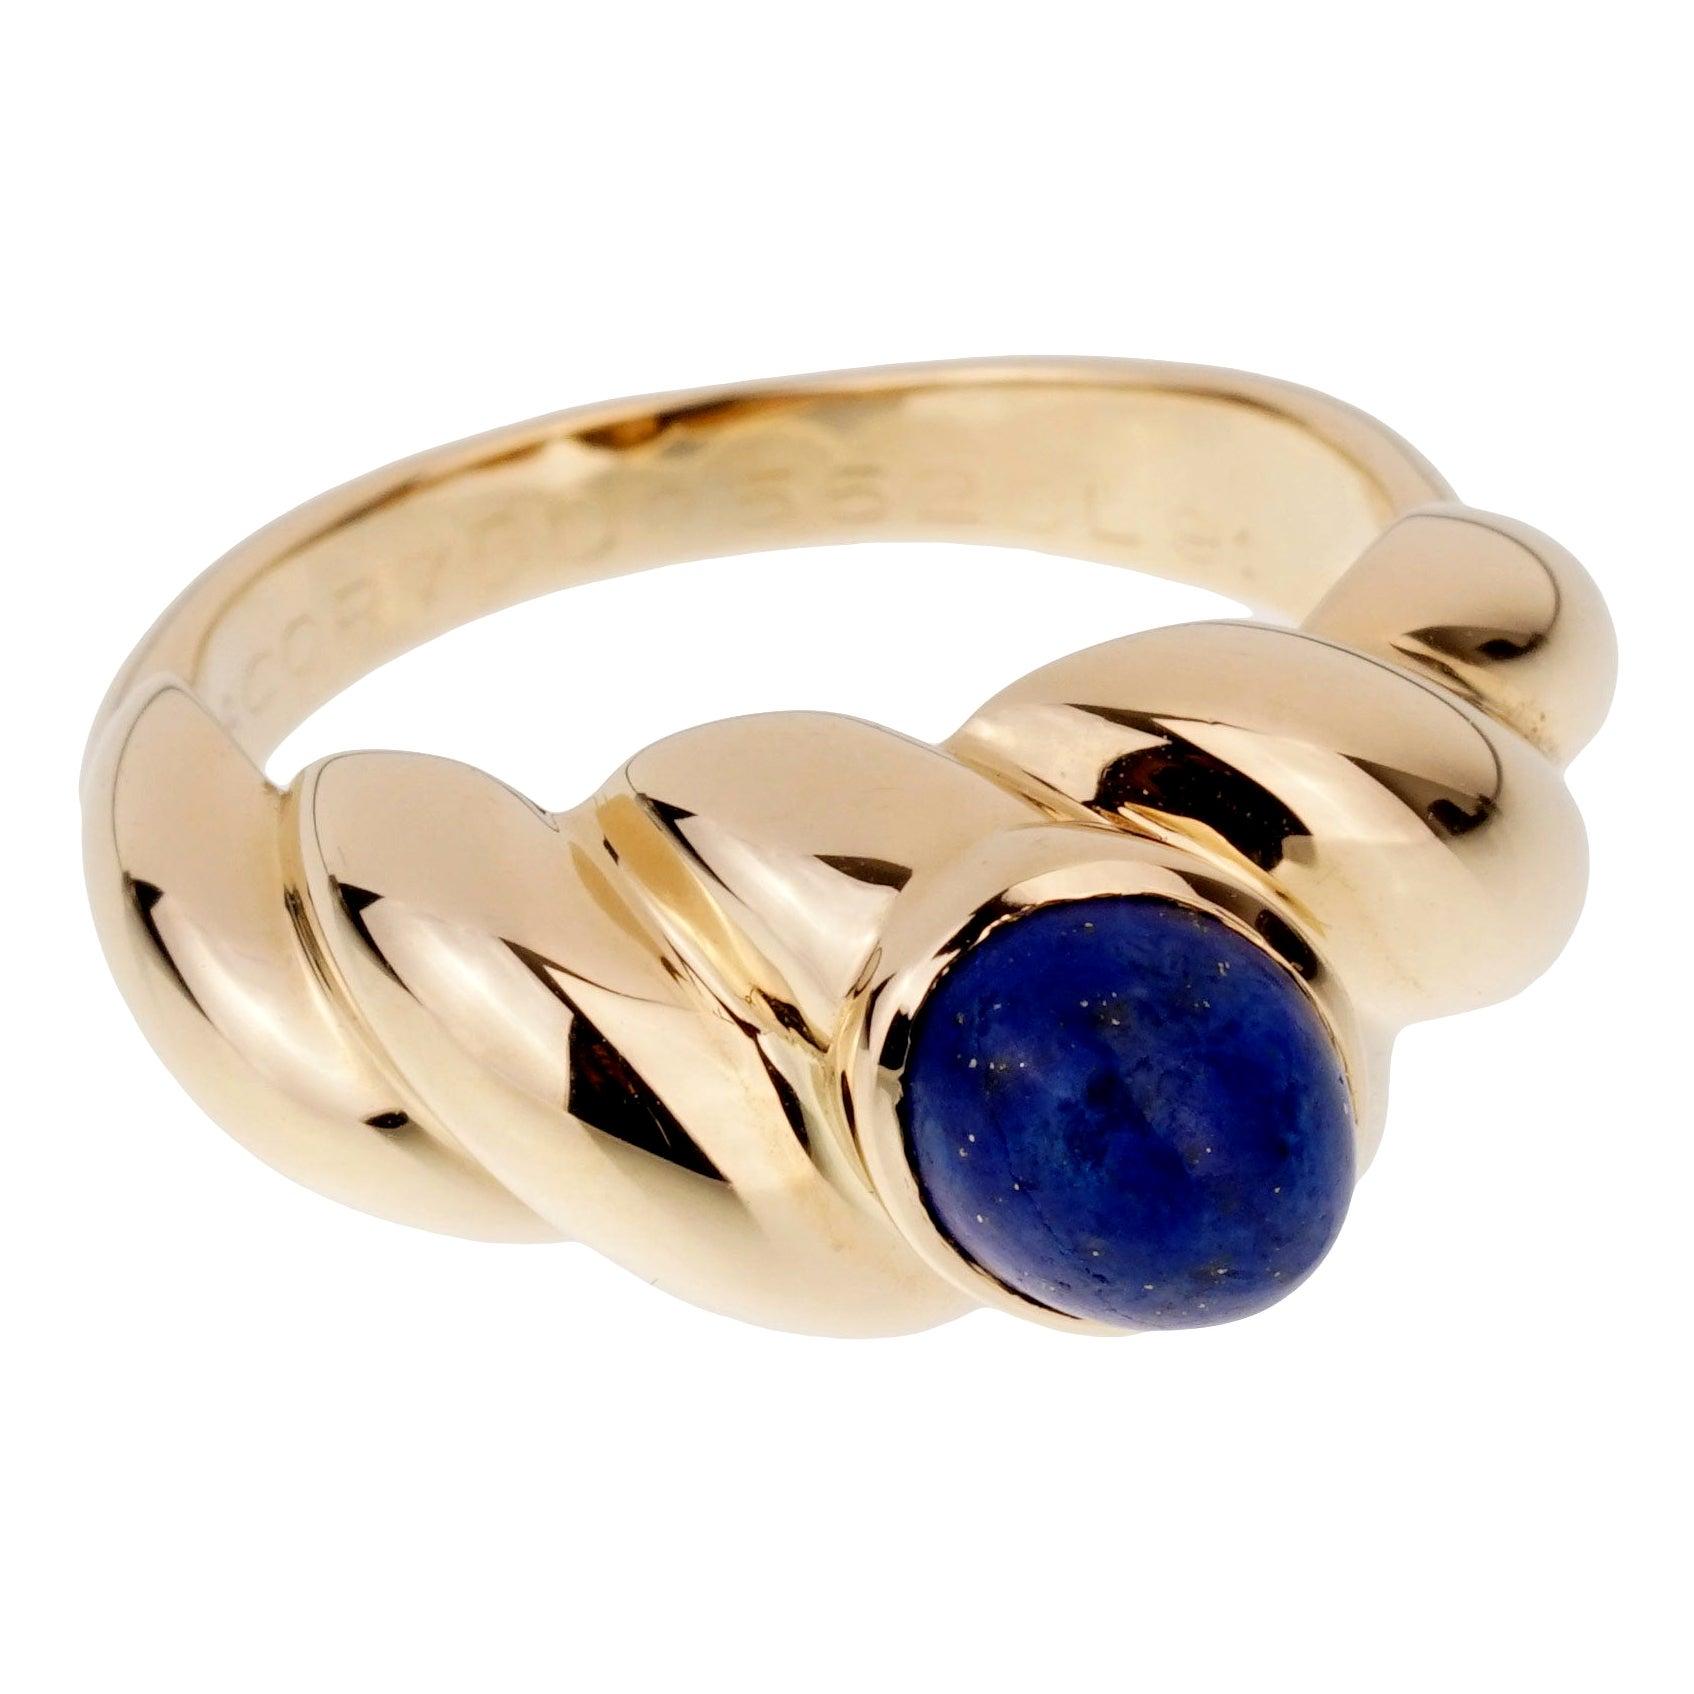 Van Cleef & Arpels Yellow Gold Lapis Ring